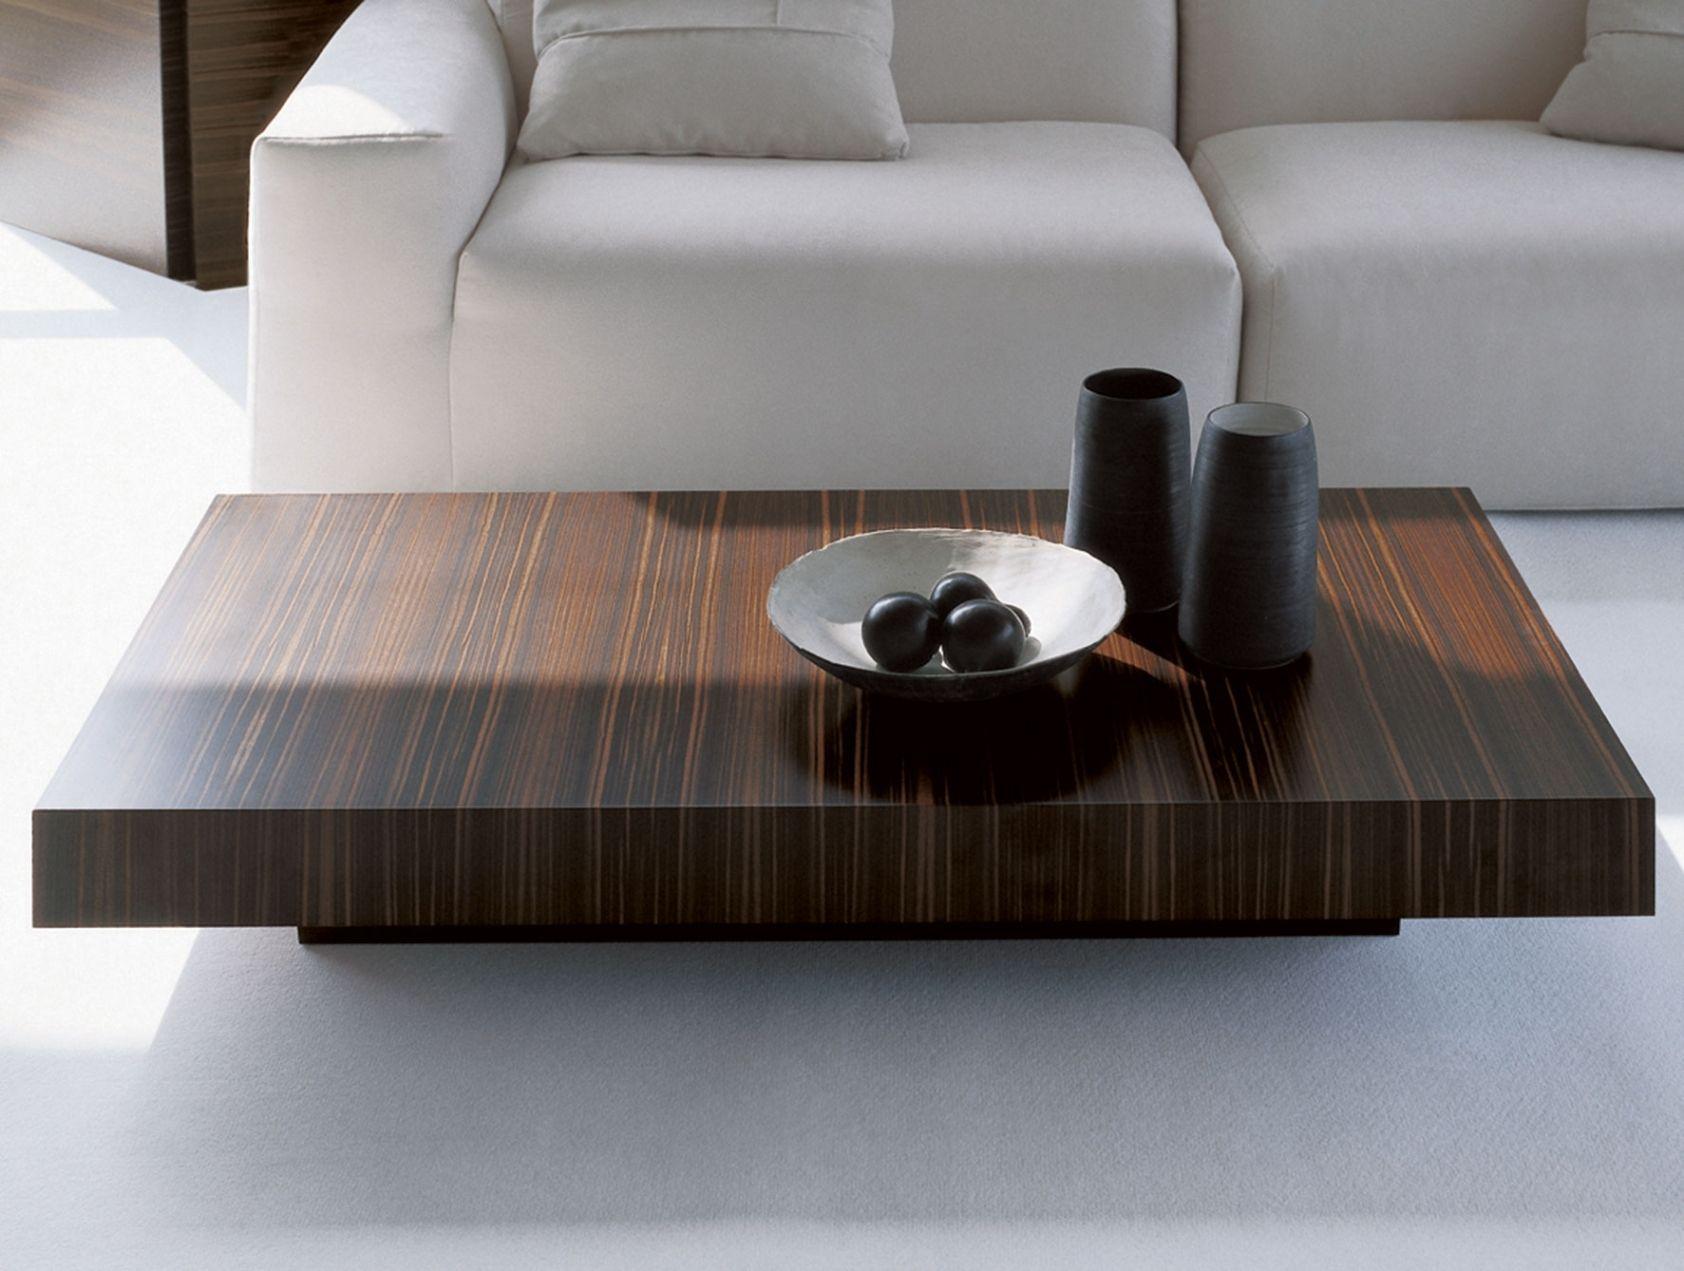 Italian Design Coffee Tables Italian Contemporary Glass Top Coffee Tables Design Italian Design Coffee Tab Coffee Table Coffee Table Wood Coffee Table Design [ 1271 x 1684 Pixel ]